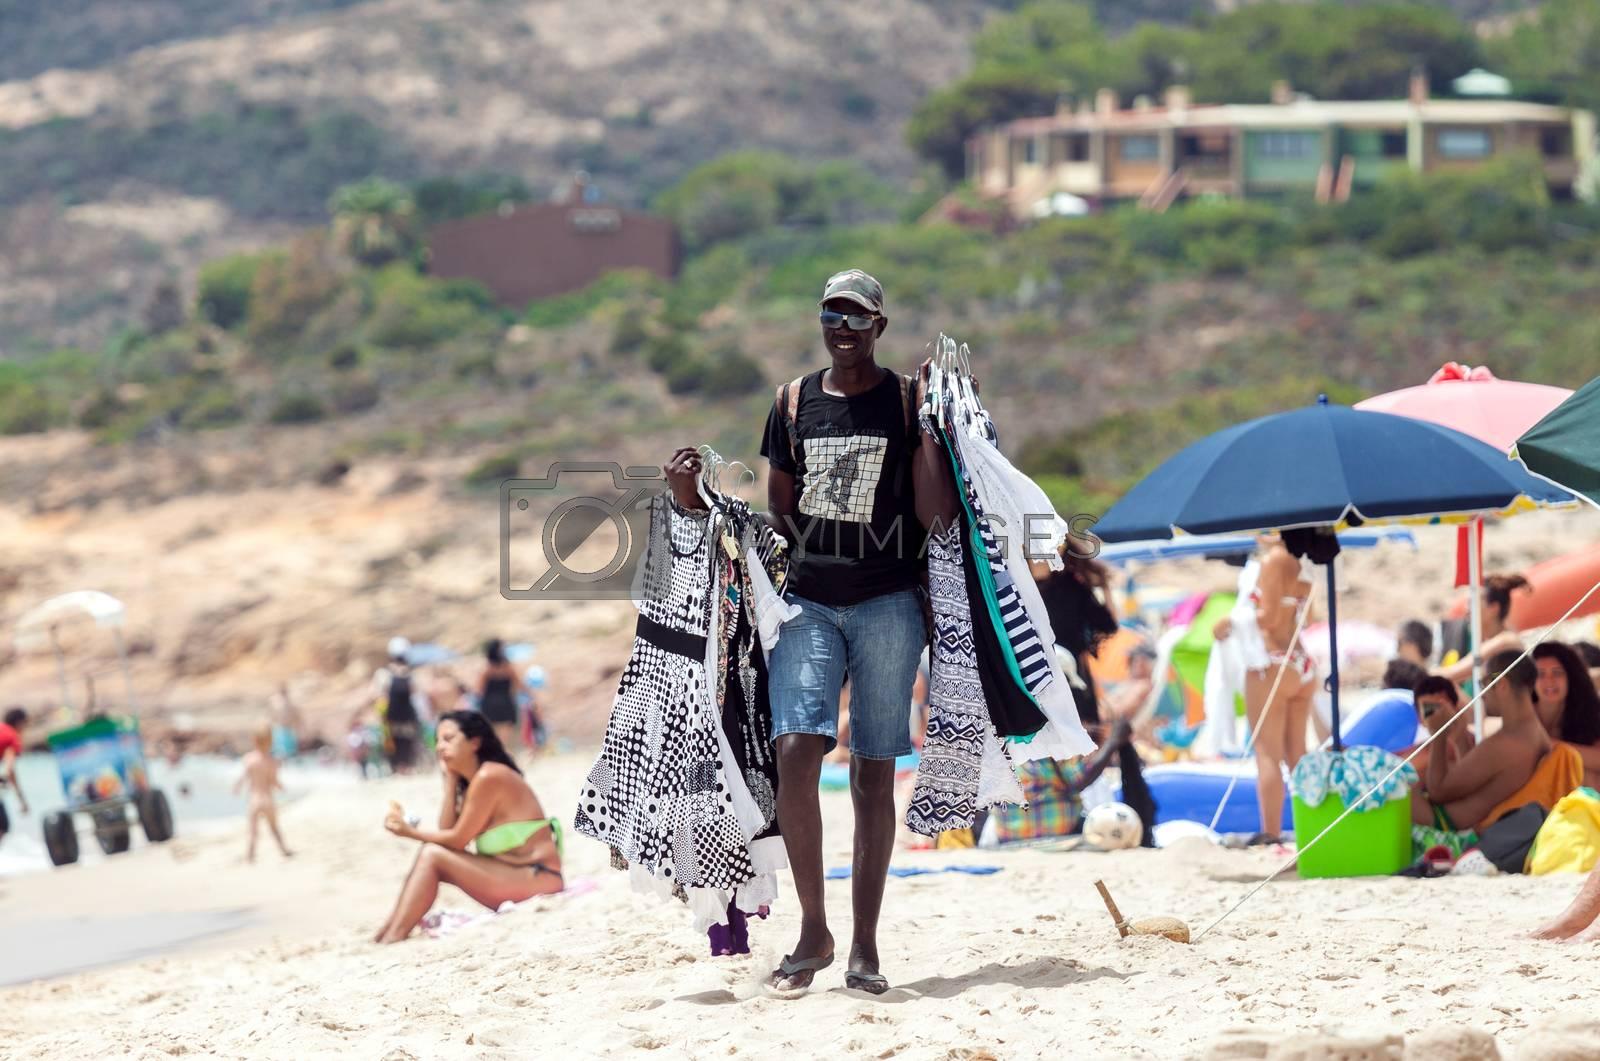 SANTA MARGHERITA DI PULA, ITALY - JULY 05, 2016: Black man selling clothes in Santa Margherita di Pula beach in Sardinia, Italy